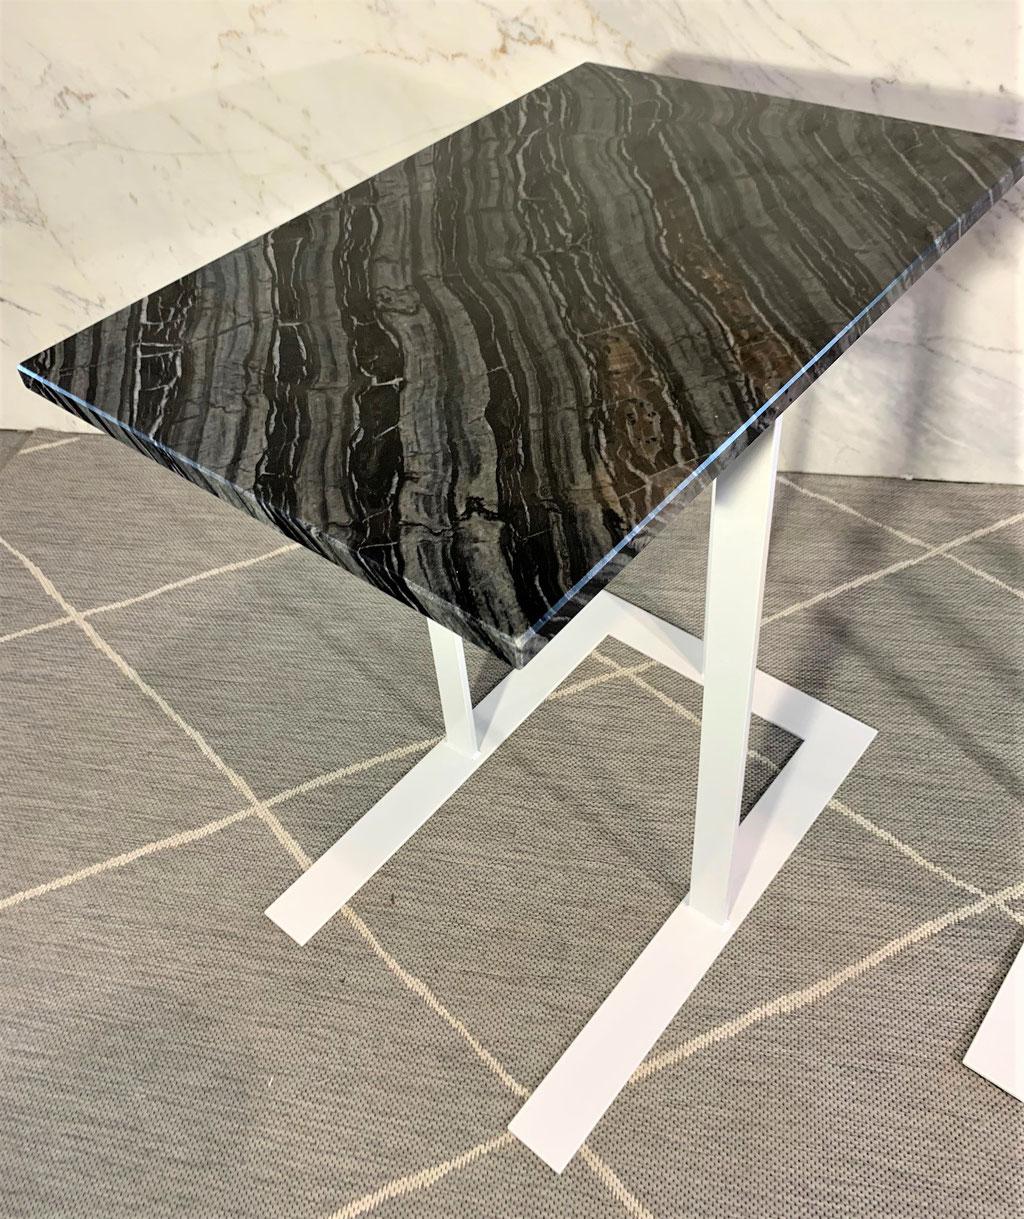 Silver Wave quartzite